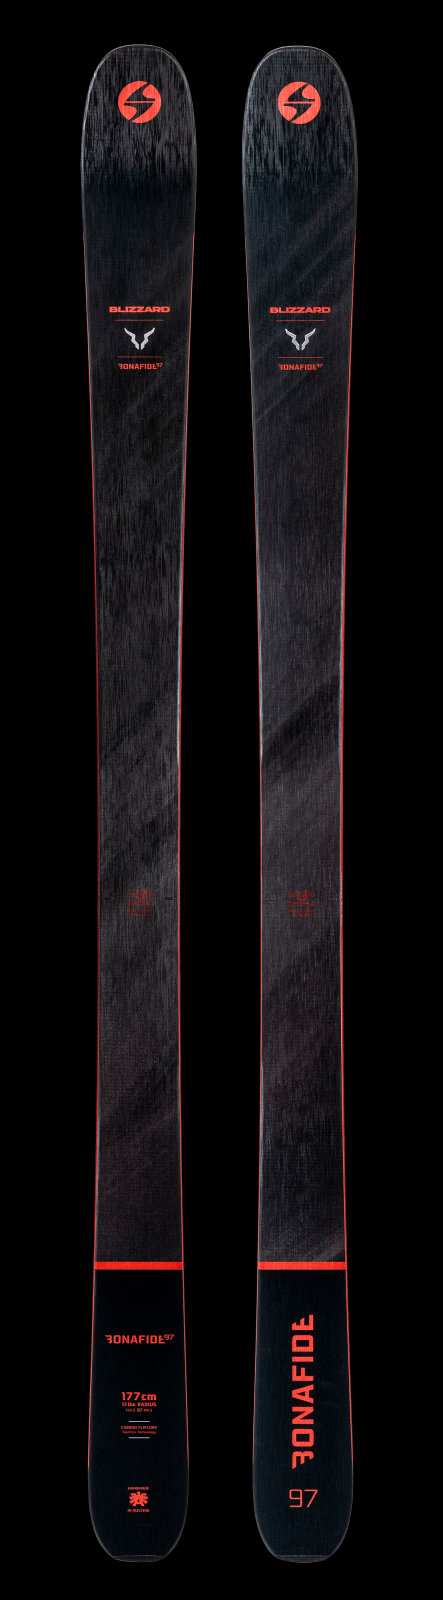 2021 Blizzard Bonafide 97 Men's Skis